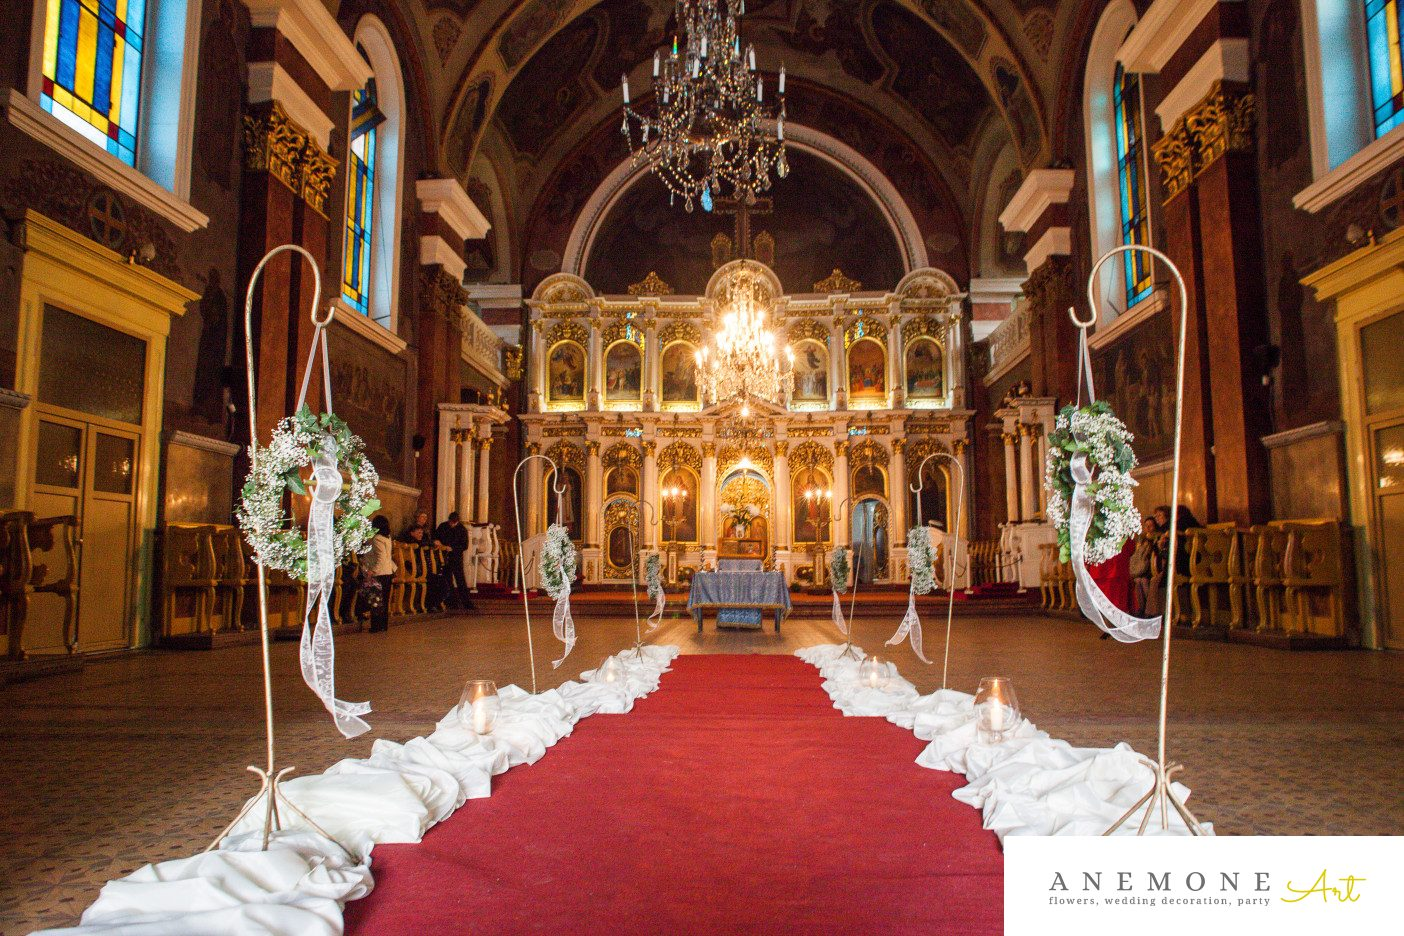 Poza, foto cu Flori de nunta coronita, decor biserica in Arad, Timisoara, Oradea (wedding flowers, bouquets) nunta Arad, Timisoara, Oradea